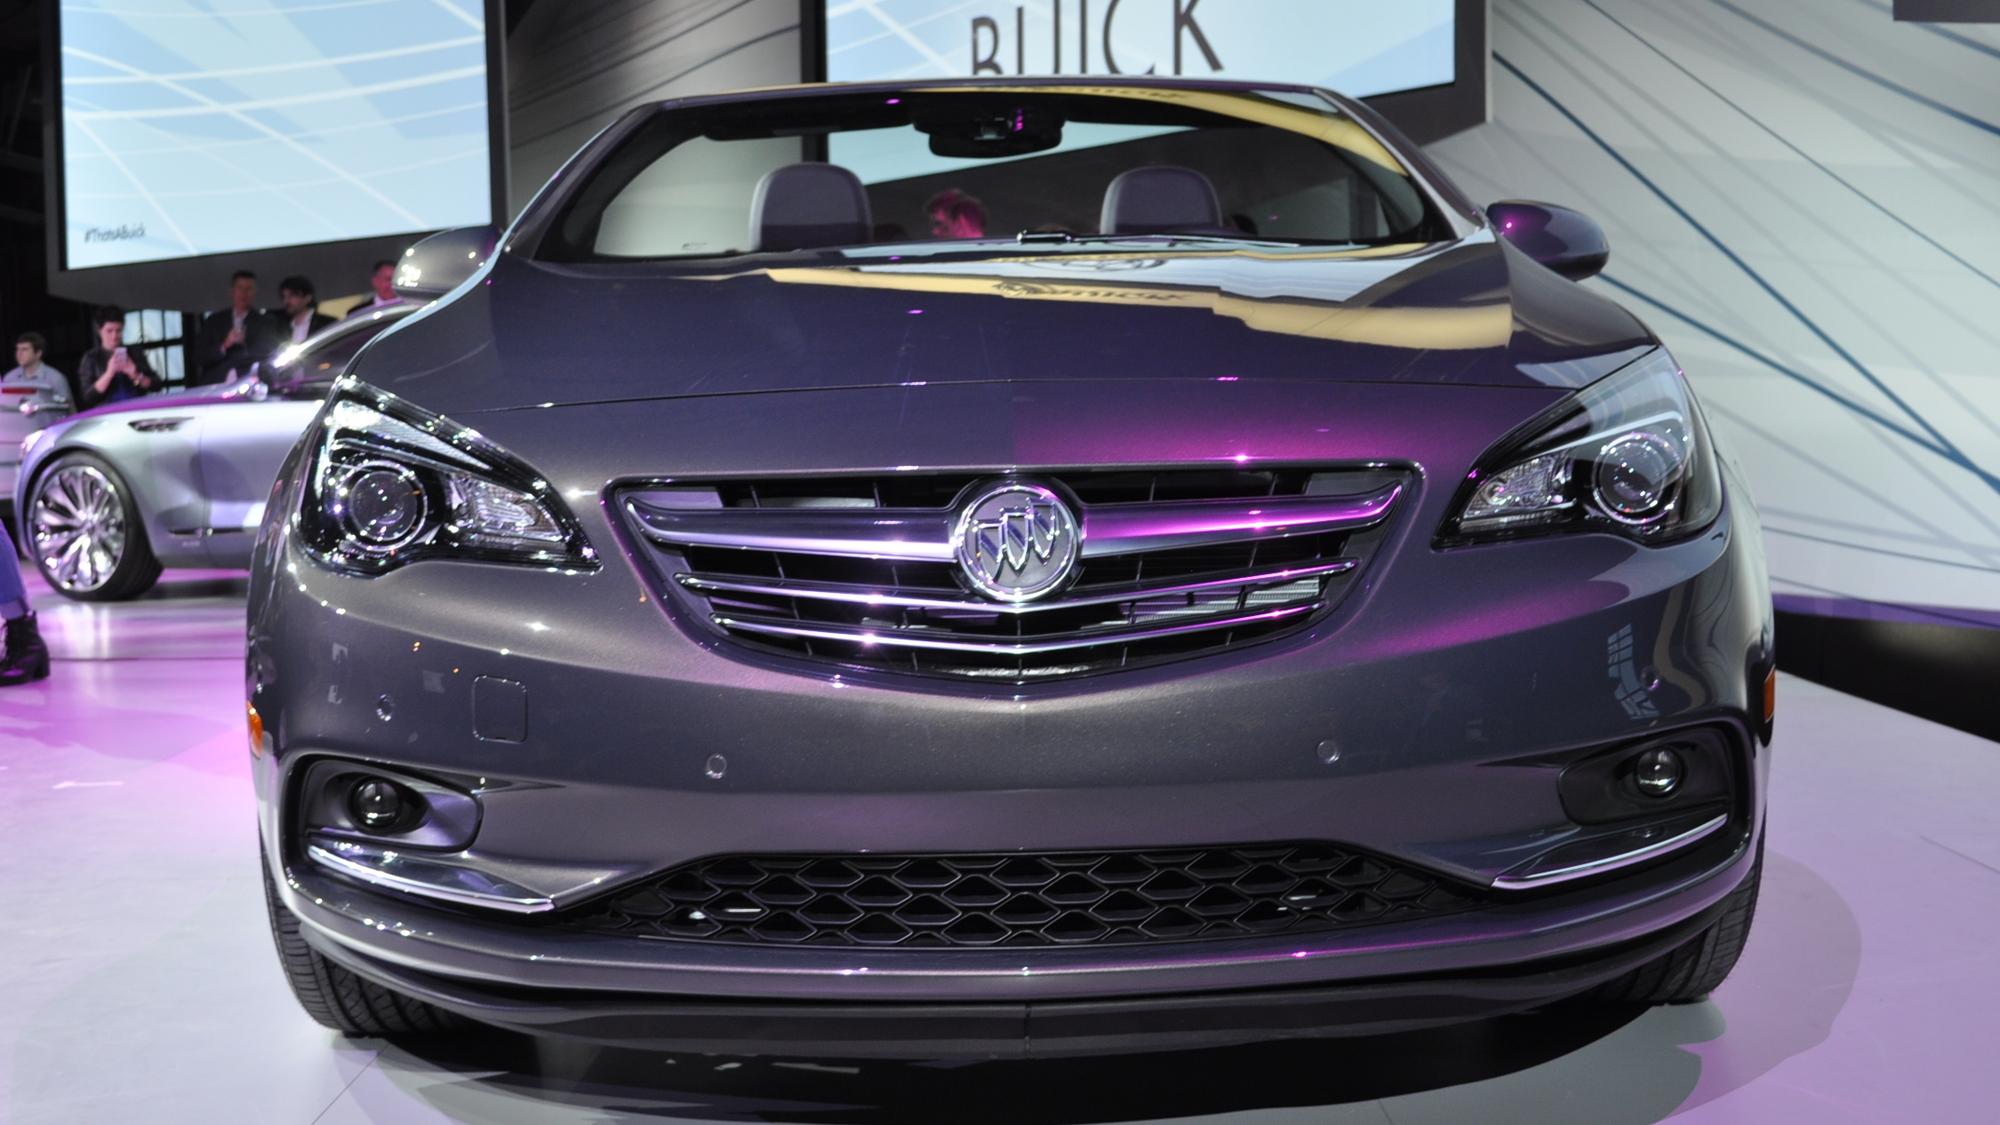 2016 Buick Cascada Live Photos - 2015 Detroit Auto Show